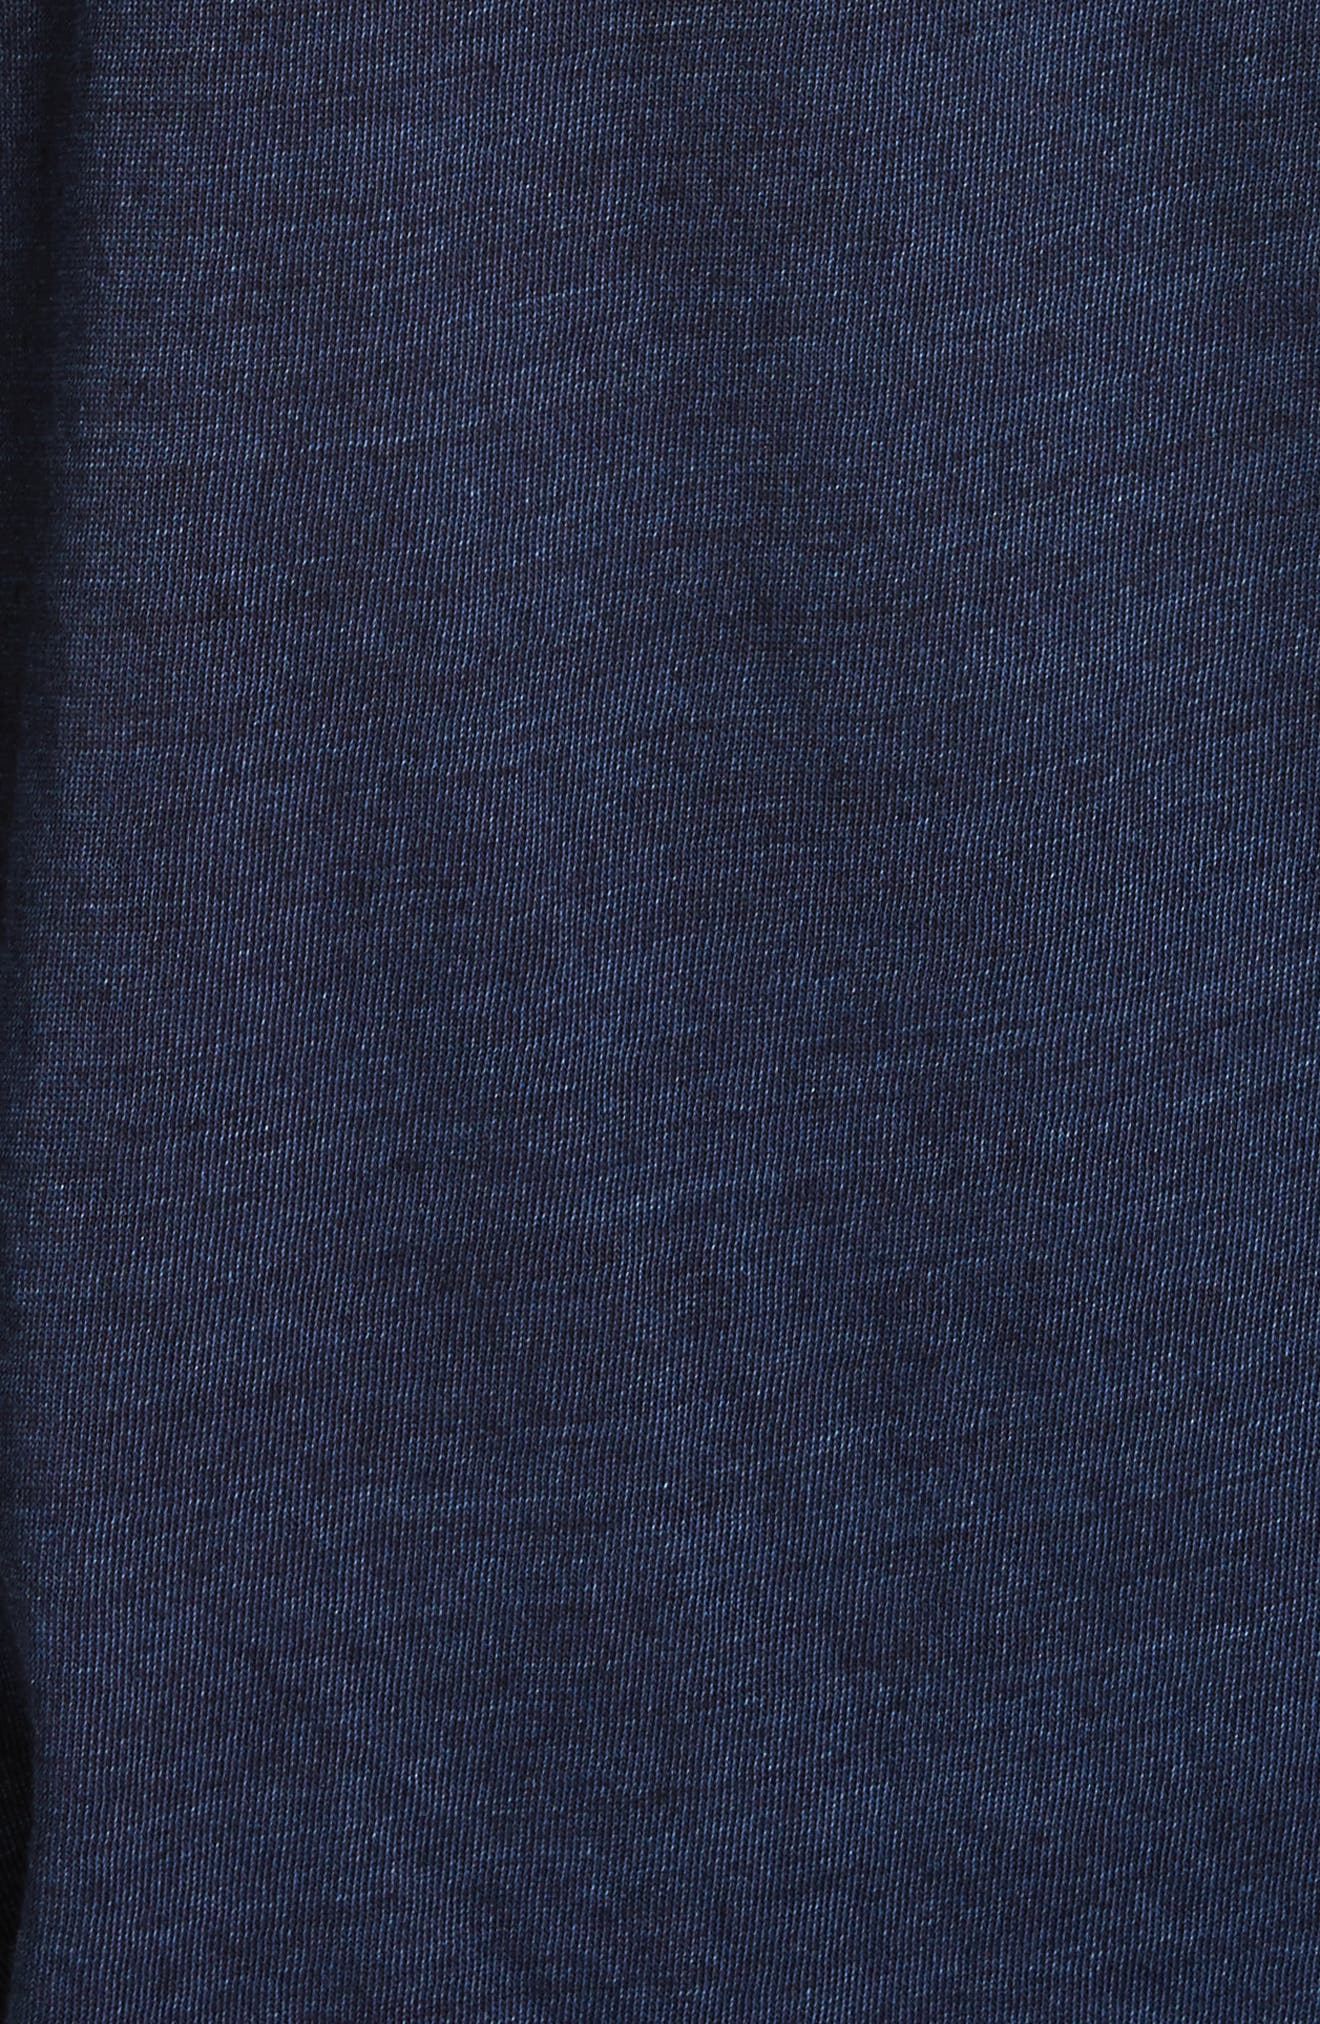 Alternate Image 5  - Soft Joie Faylen Blouson Knit Dress